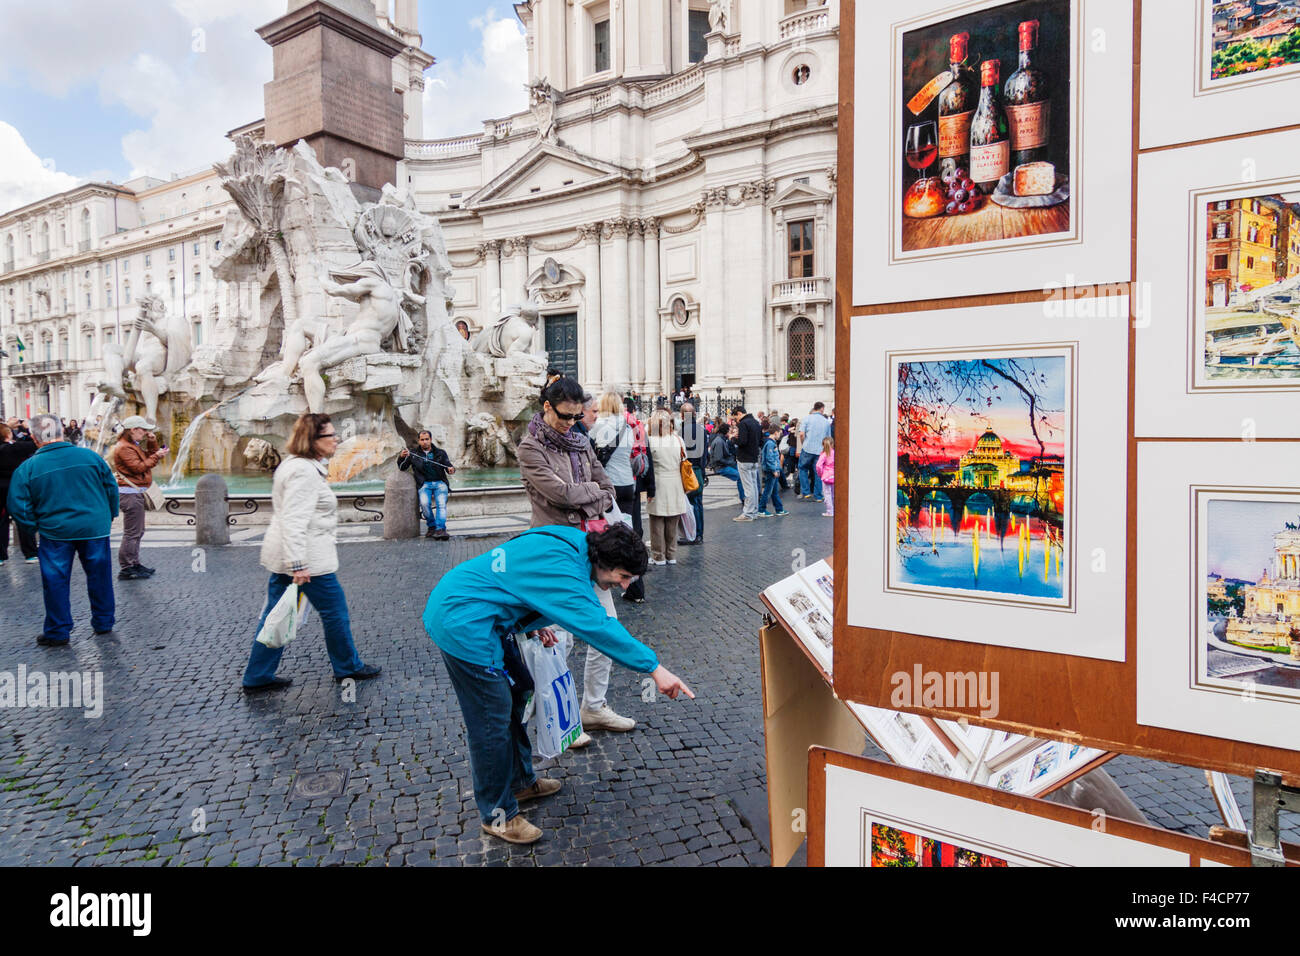 Piazza Navona, Rome, Italy - Stock Image